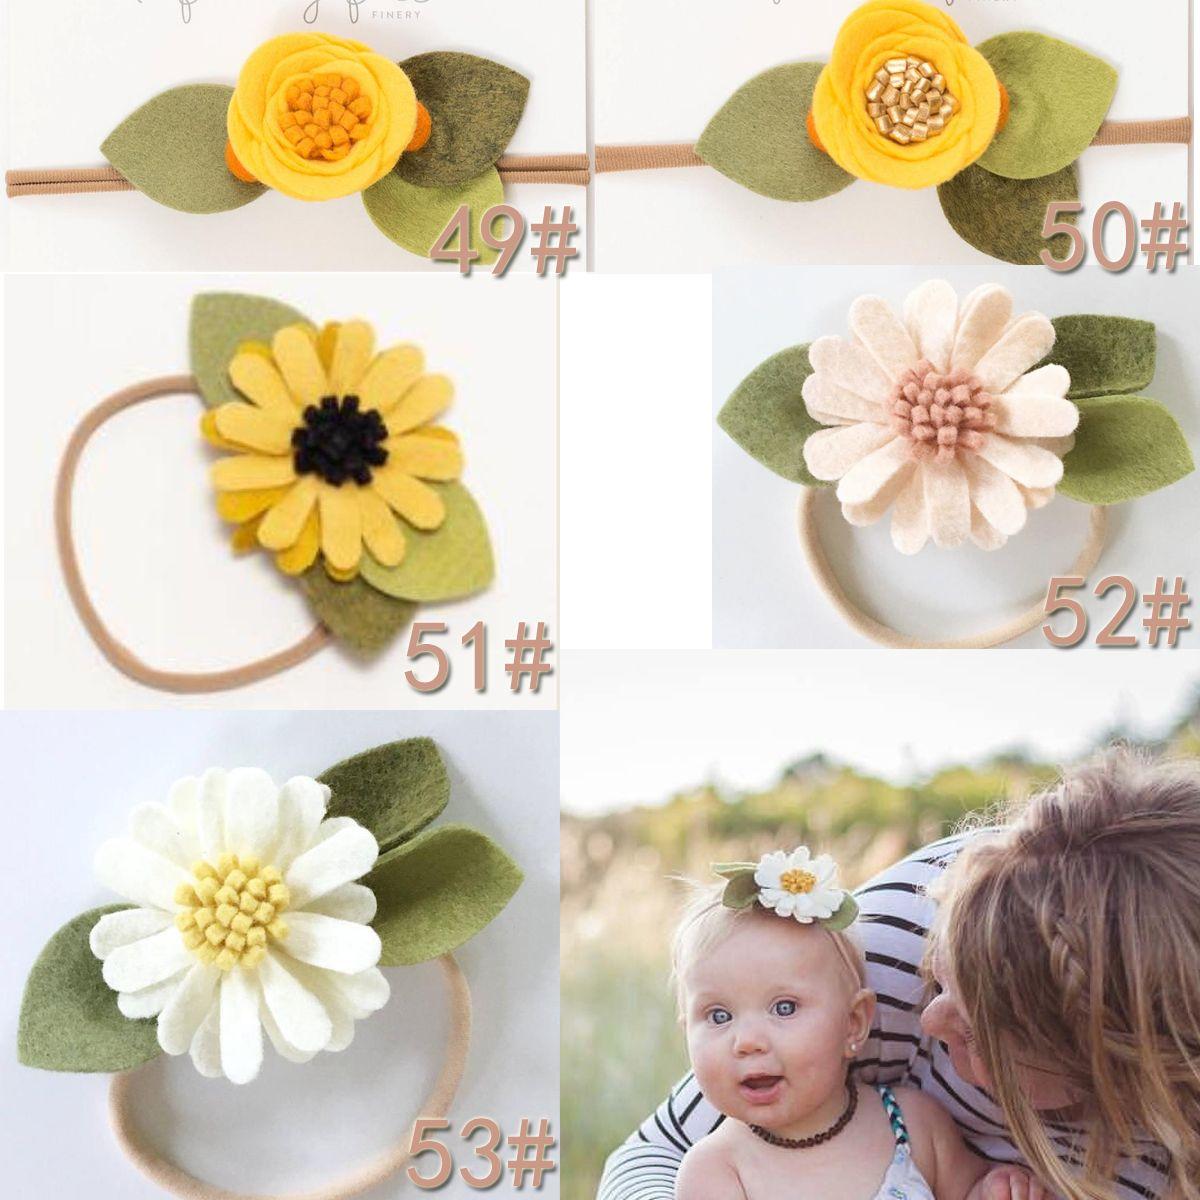 Hot ! Baby Girls Kids Lovely Roses Hair Bands Vintage Felt ball Flowers Hair Accessories Pretty Headbands Infant Headbands 107 styles